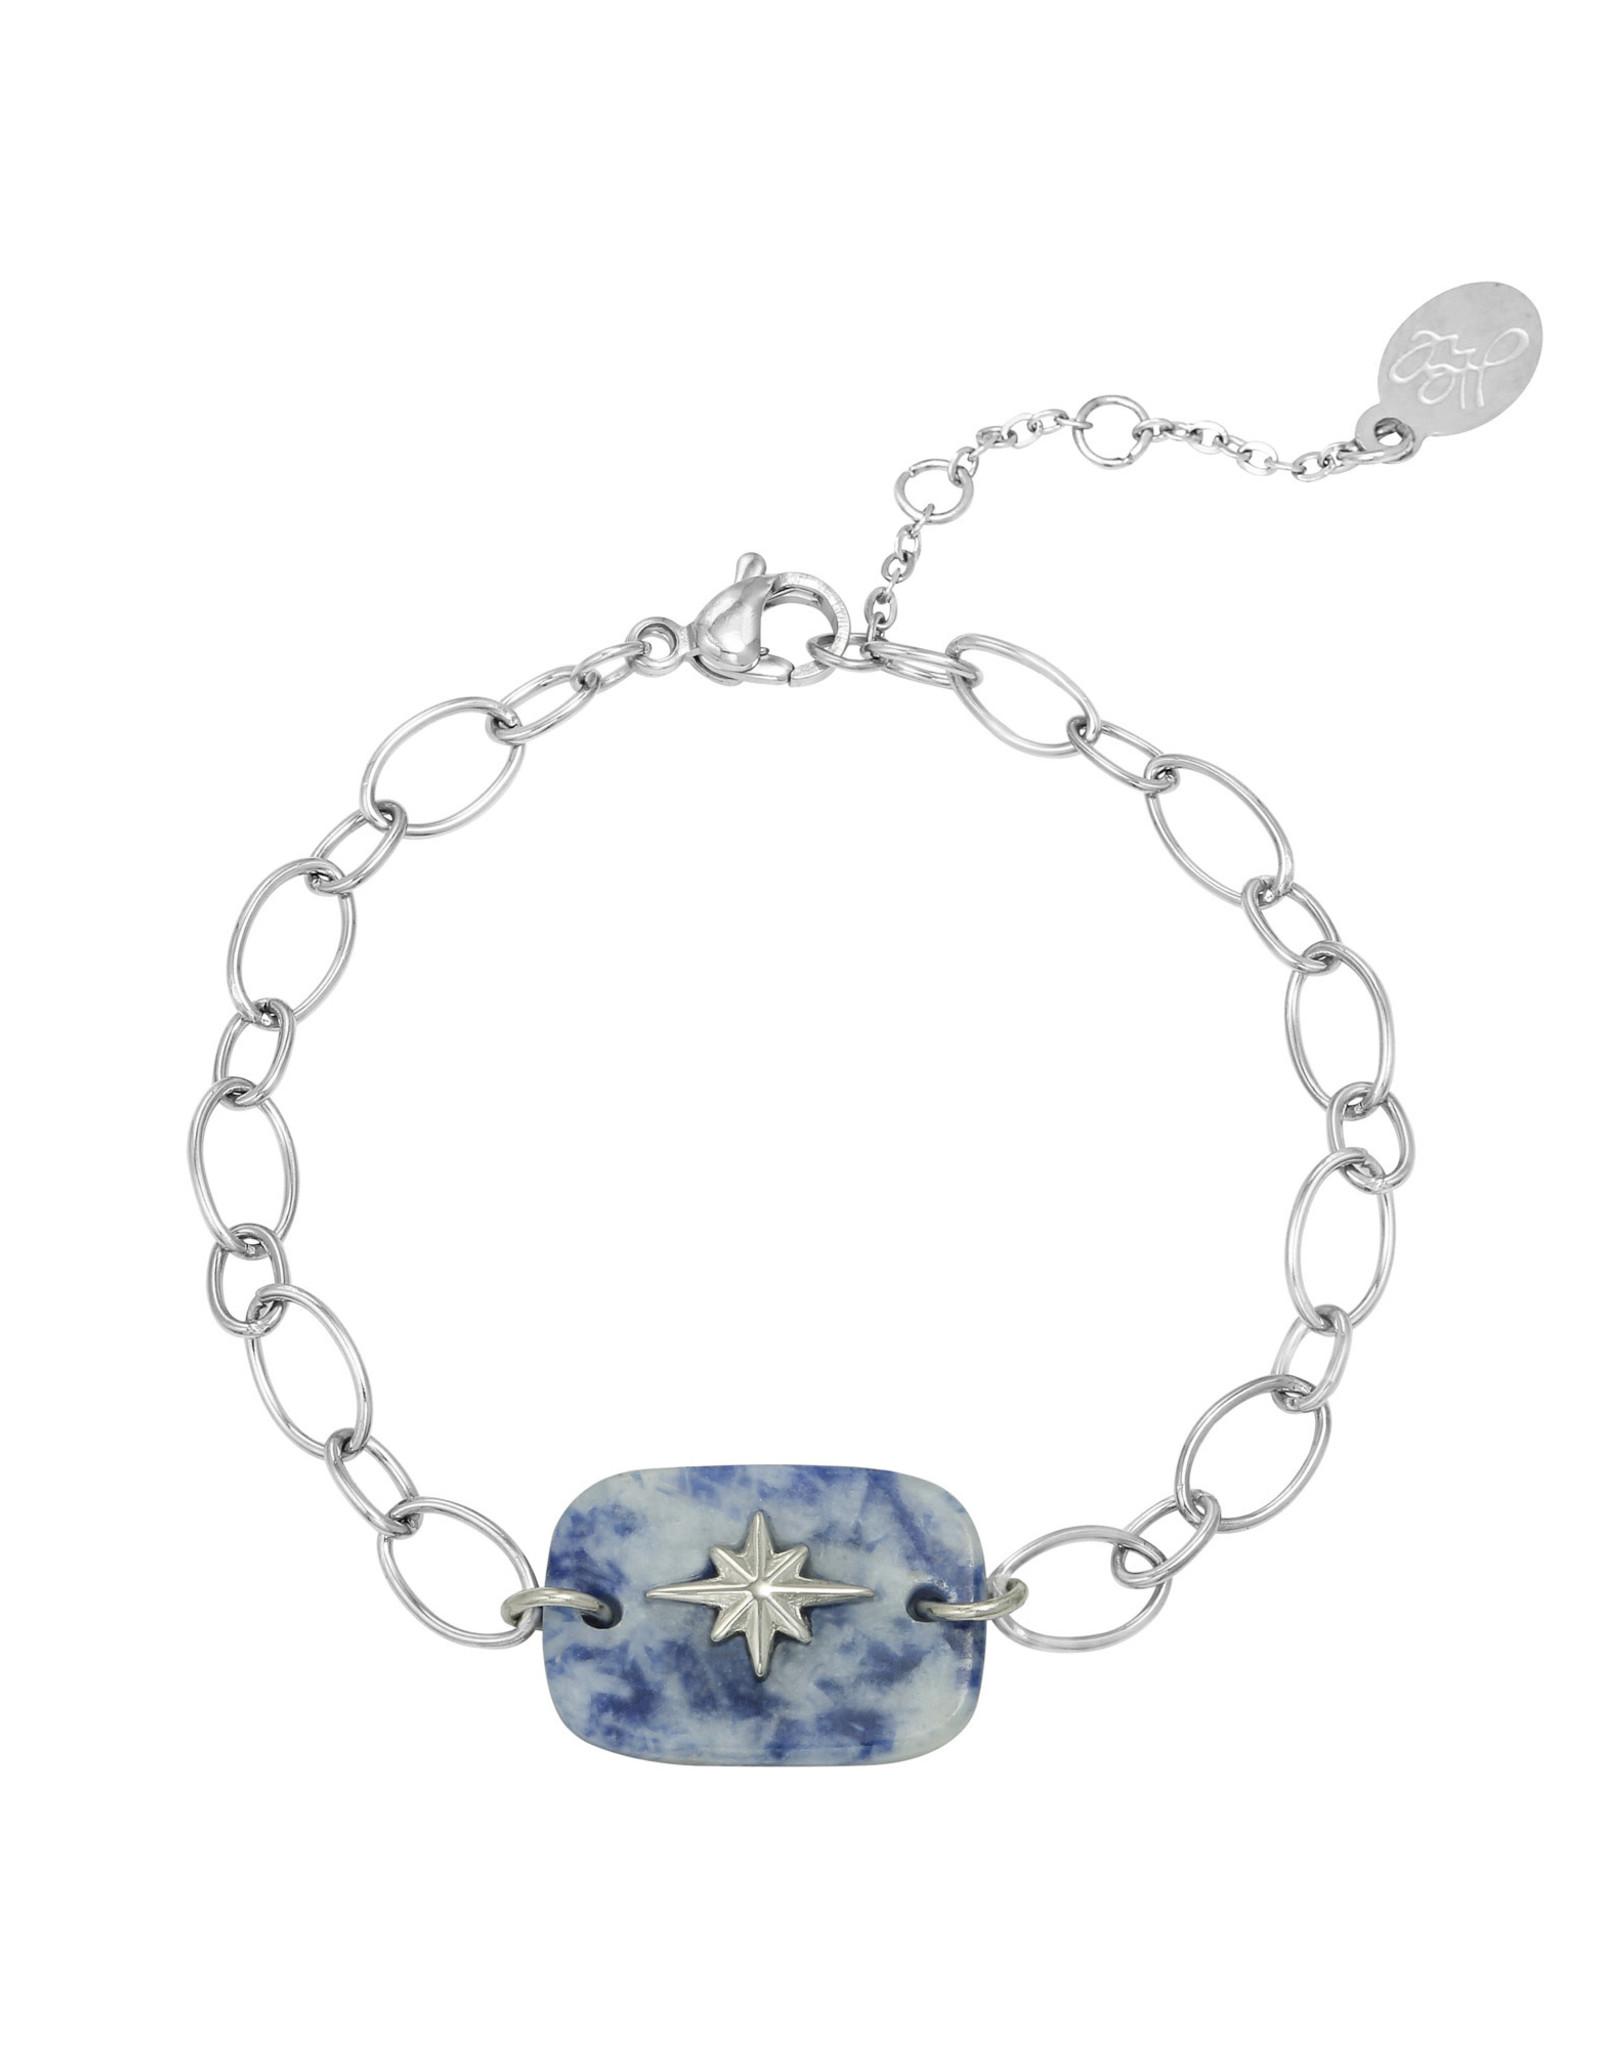 Bracelet Nature star blue silver